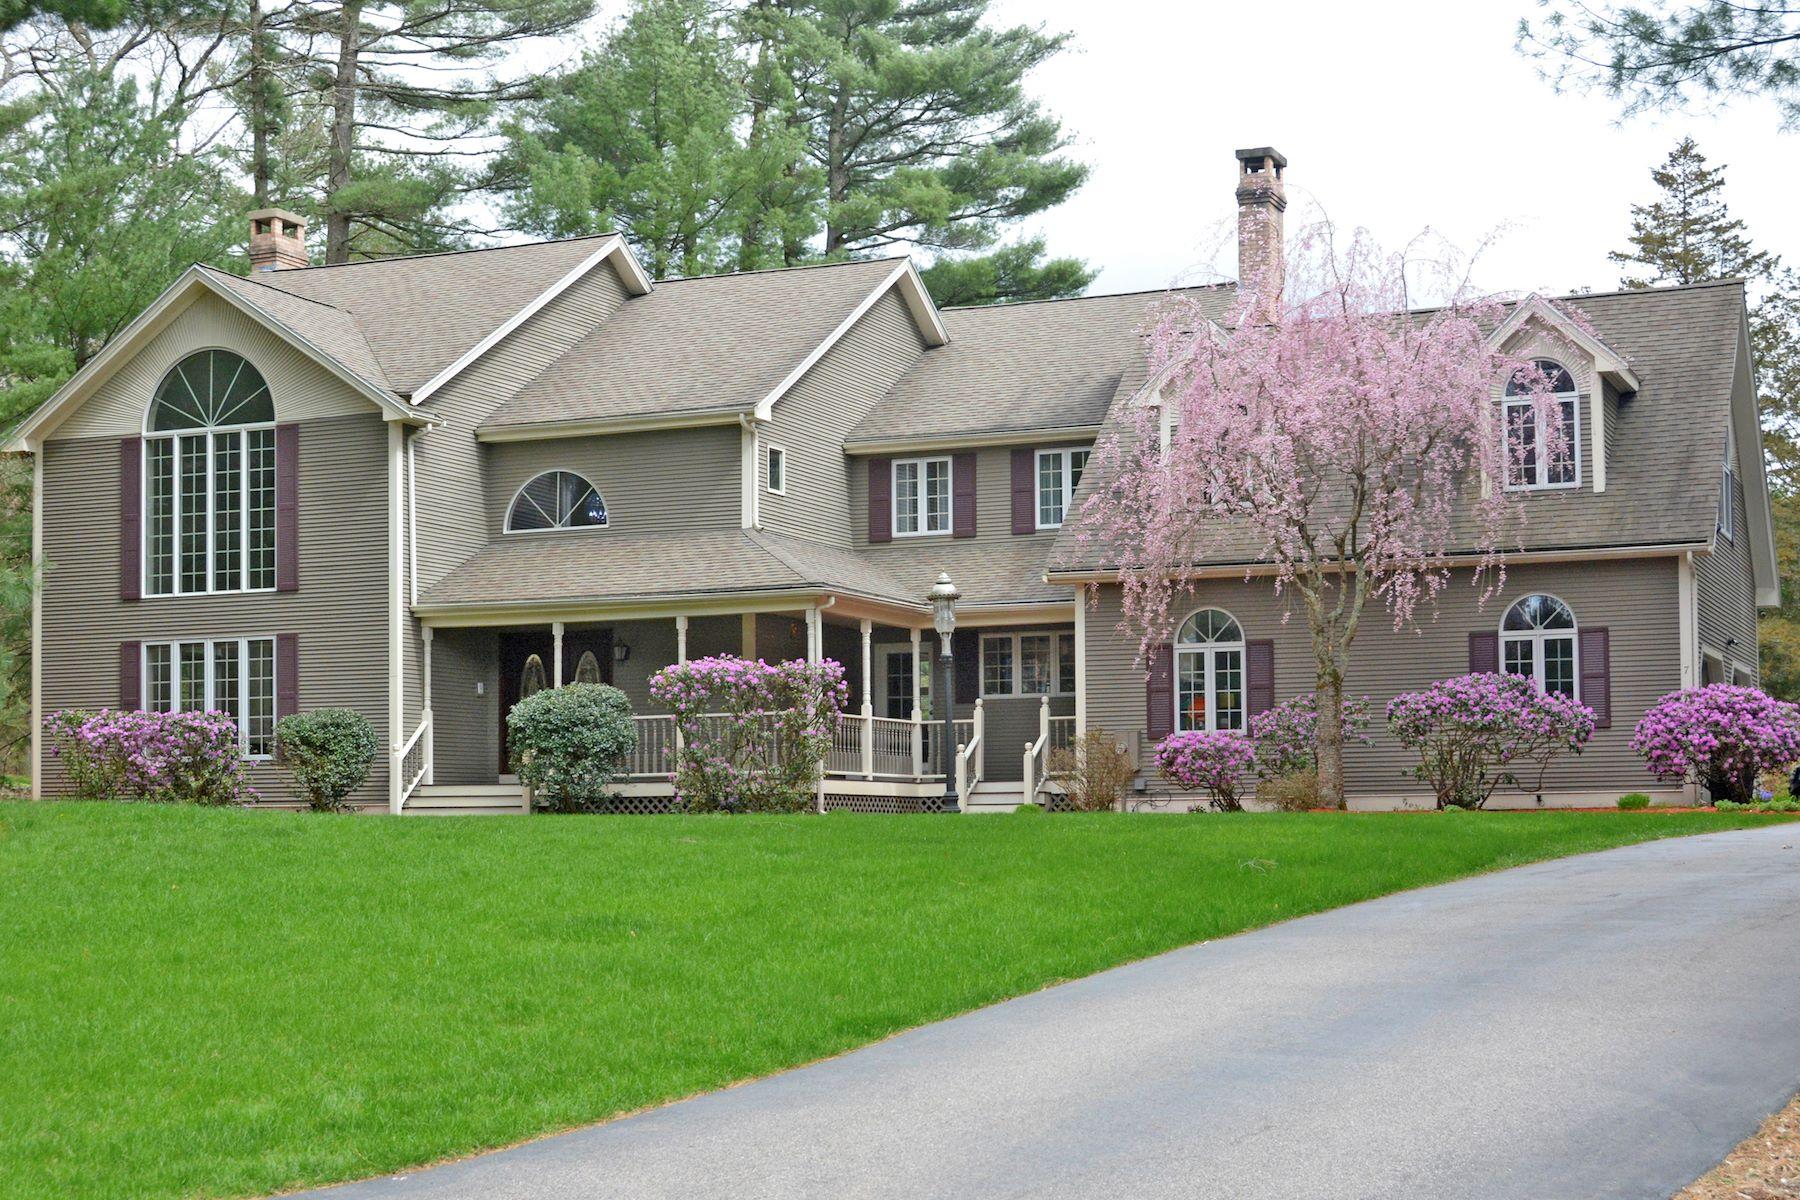 Single Family Homes for Sale at 7 Jorie Lane, Walpole 7 Jorie Lane Walpole, Massachusetts 02081 United States